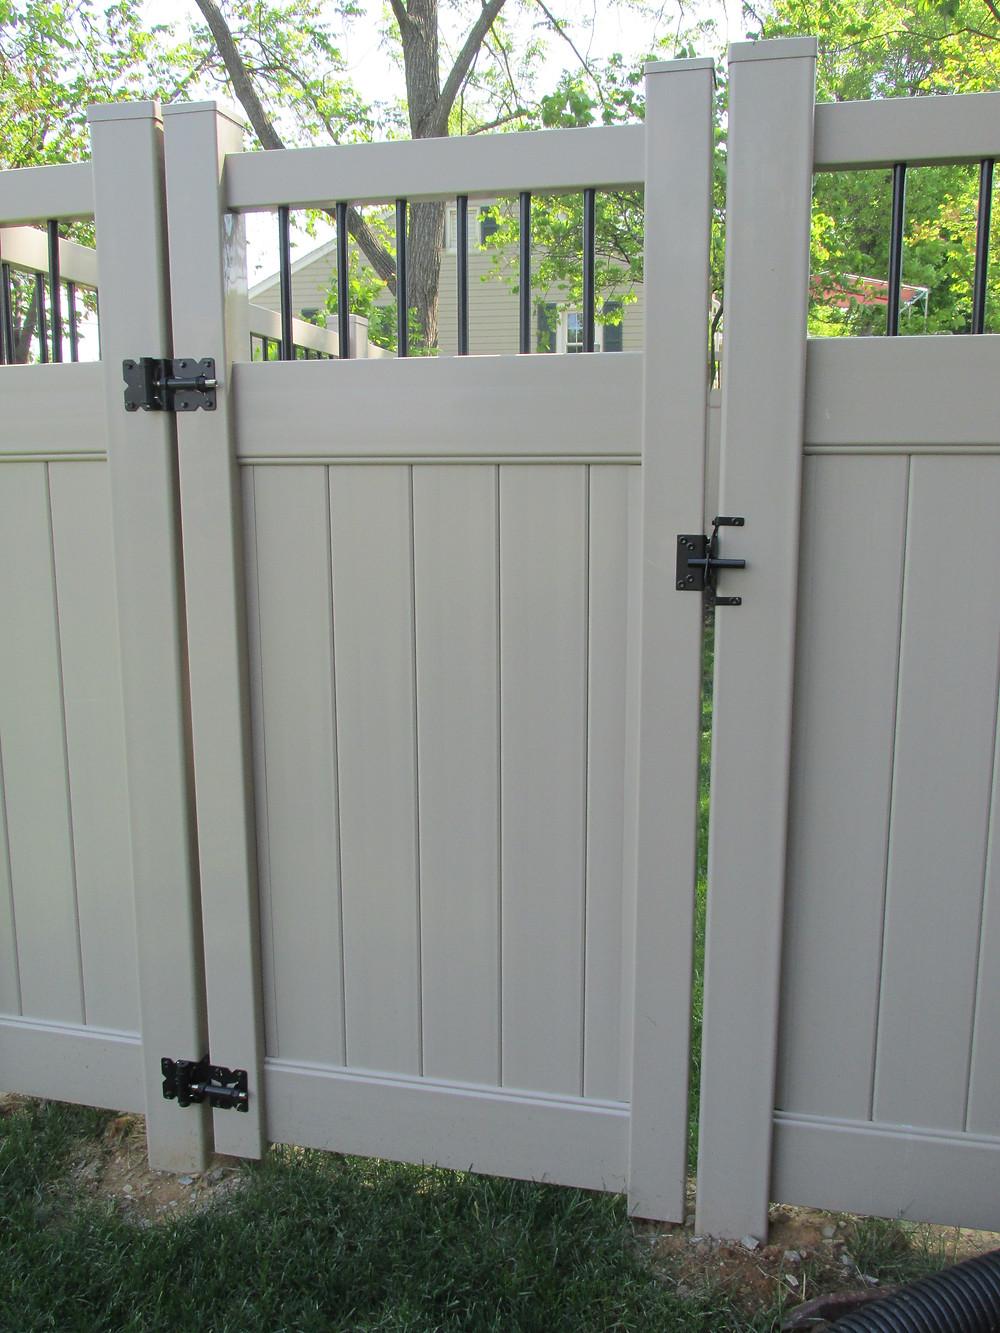 Privacy-gate-latch-hybrid-fence-vinyl-aluminum-liberty-mechanicsburg-install